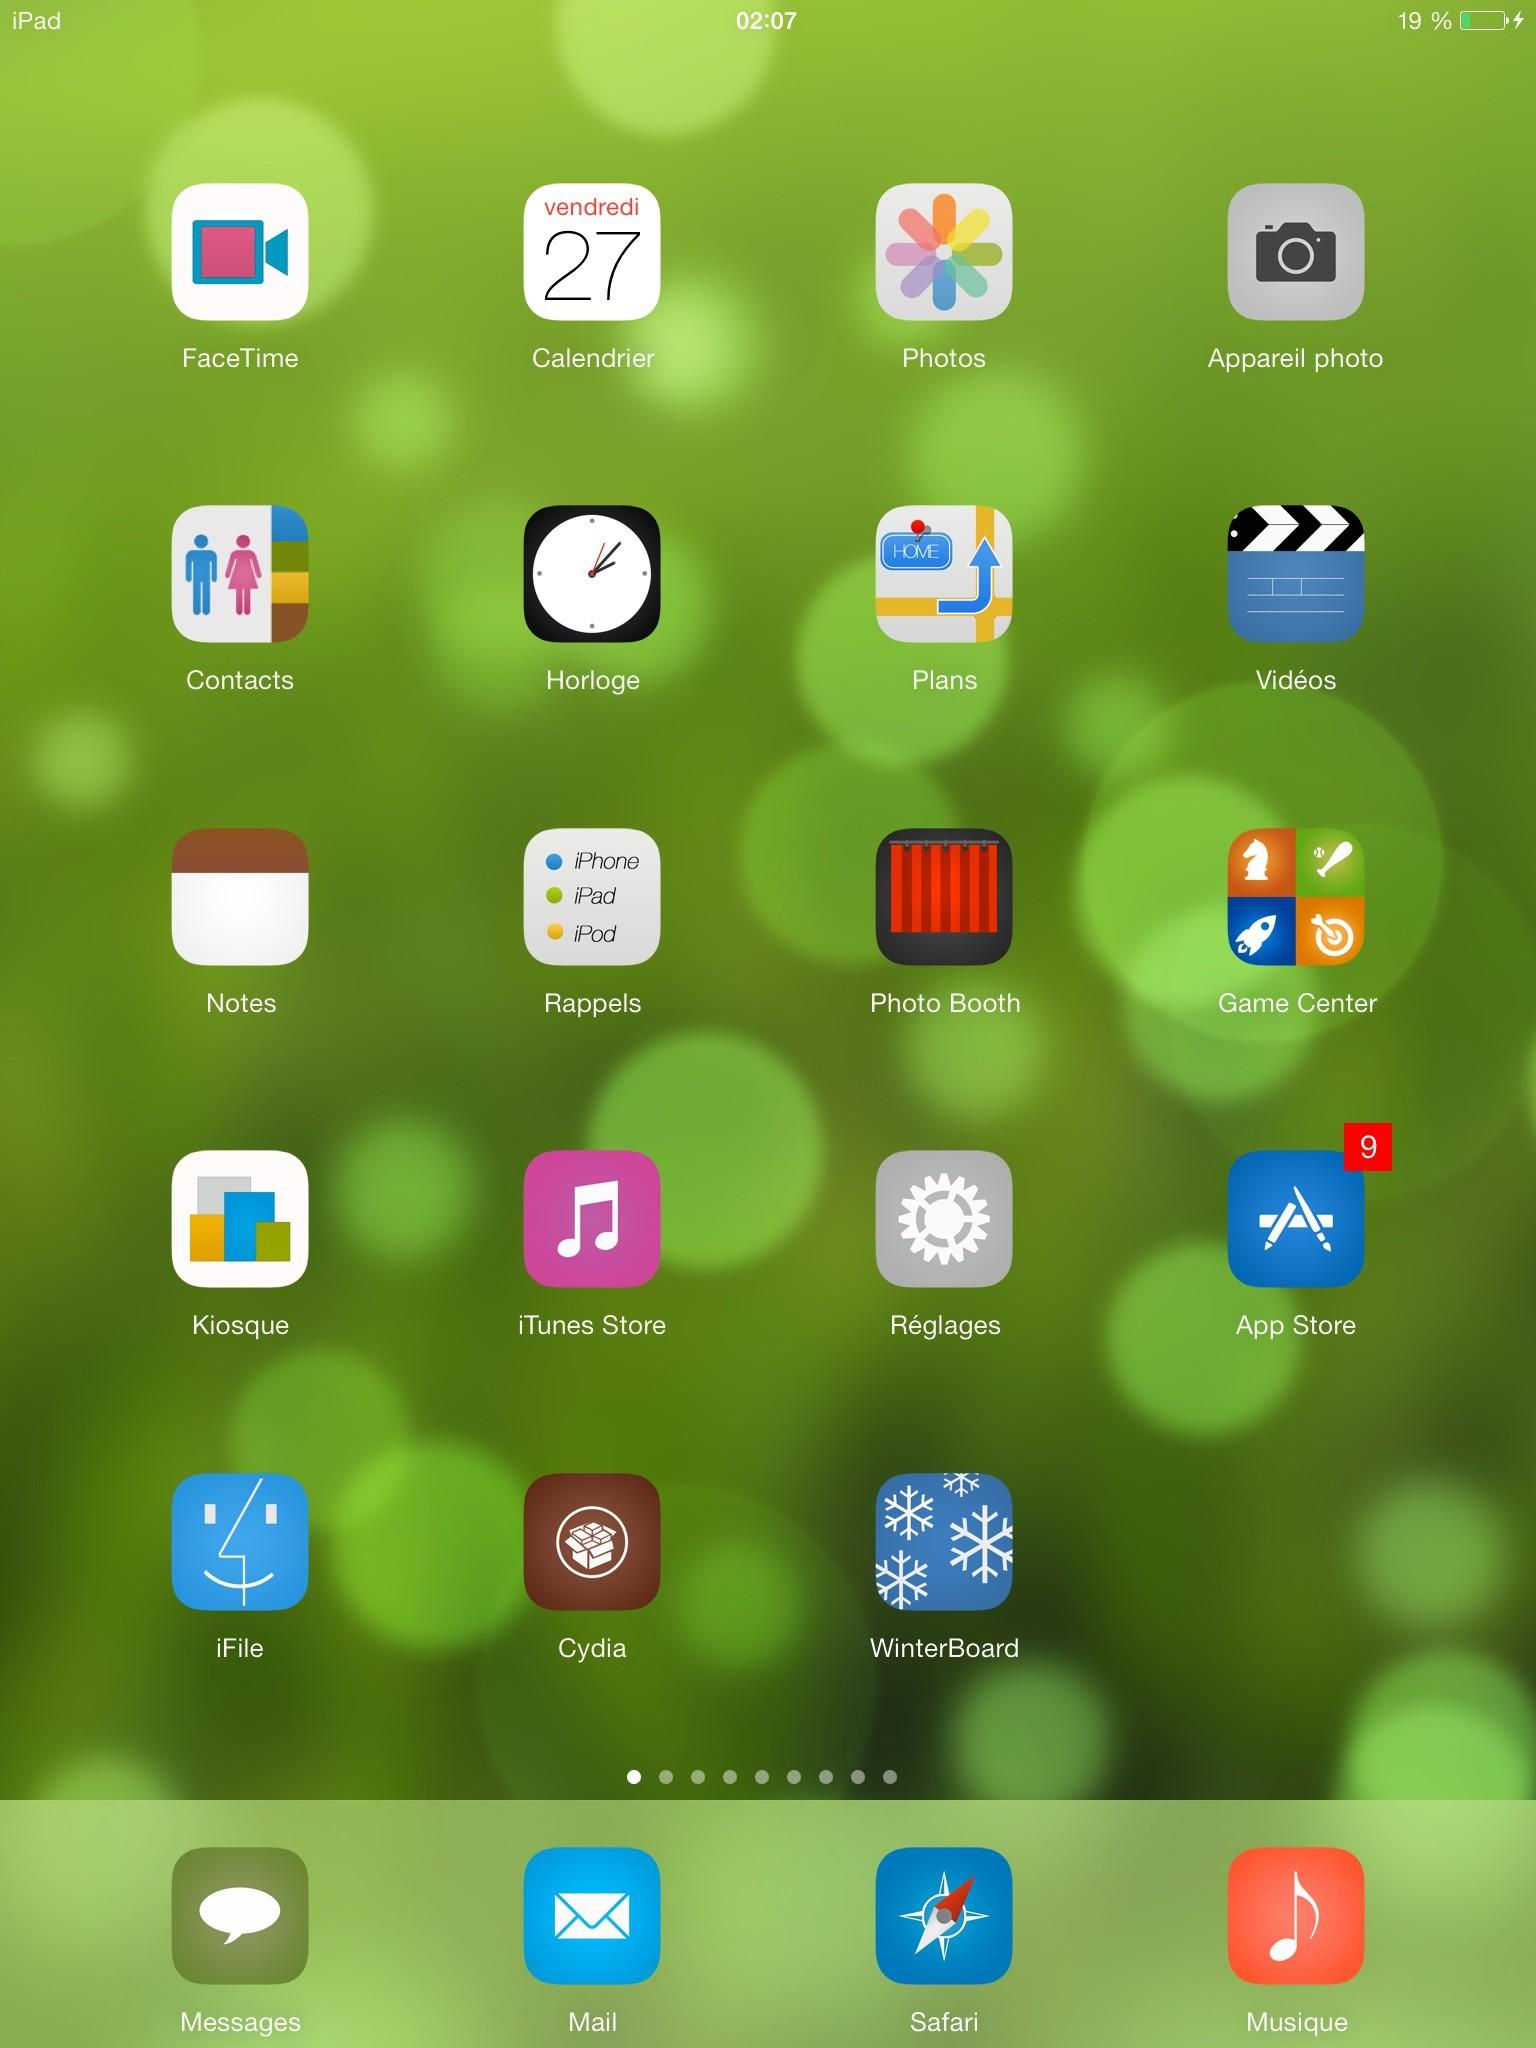 Res: 1536x2048, 08 iPad HD Dynamic Wallpaper for iOS 7 - 1.1 - Themes